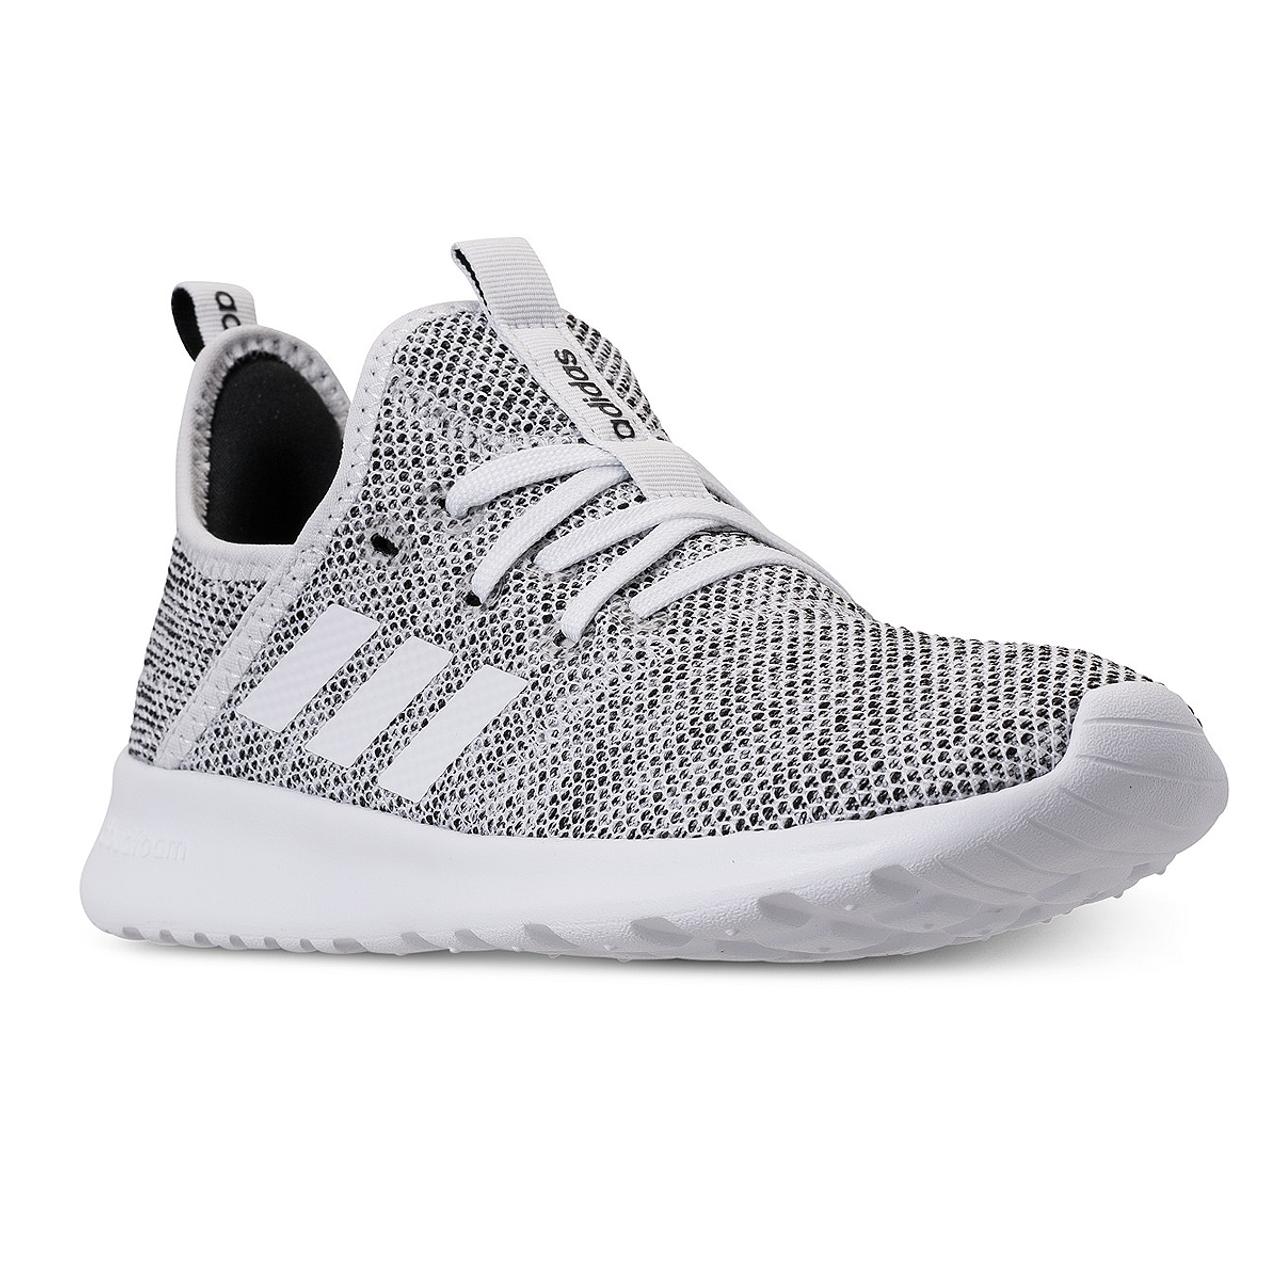 Adidas Cloudfoam Pure Women's Running Sneakers DB0695 - White, White, Black